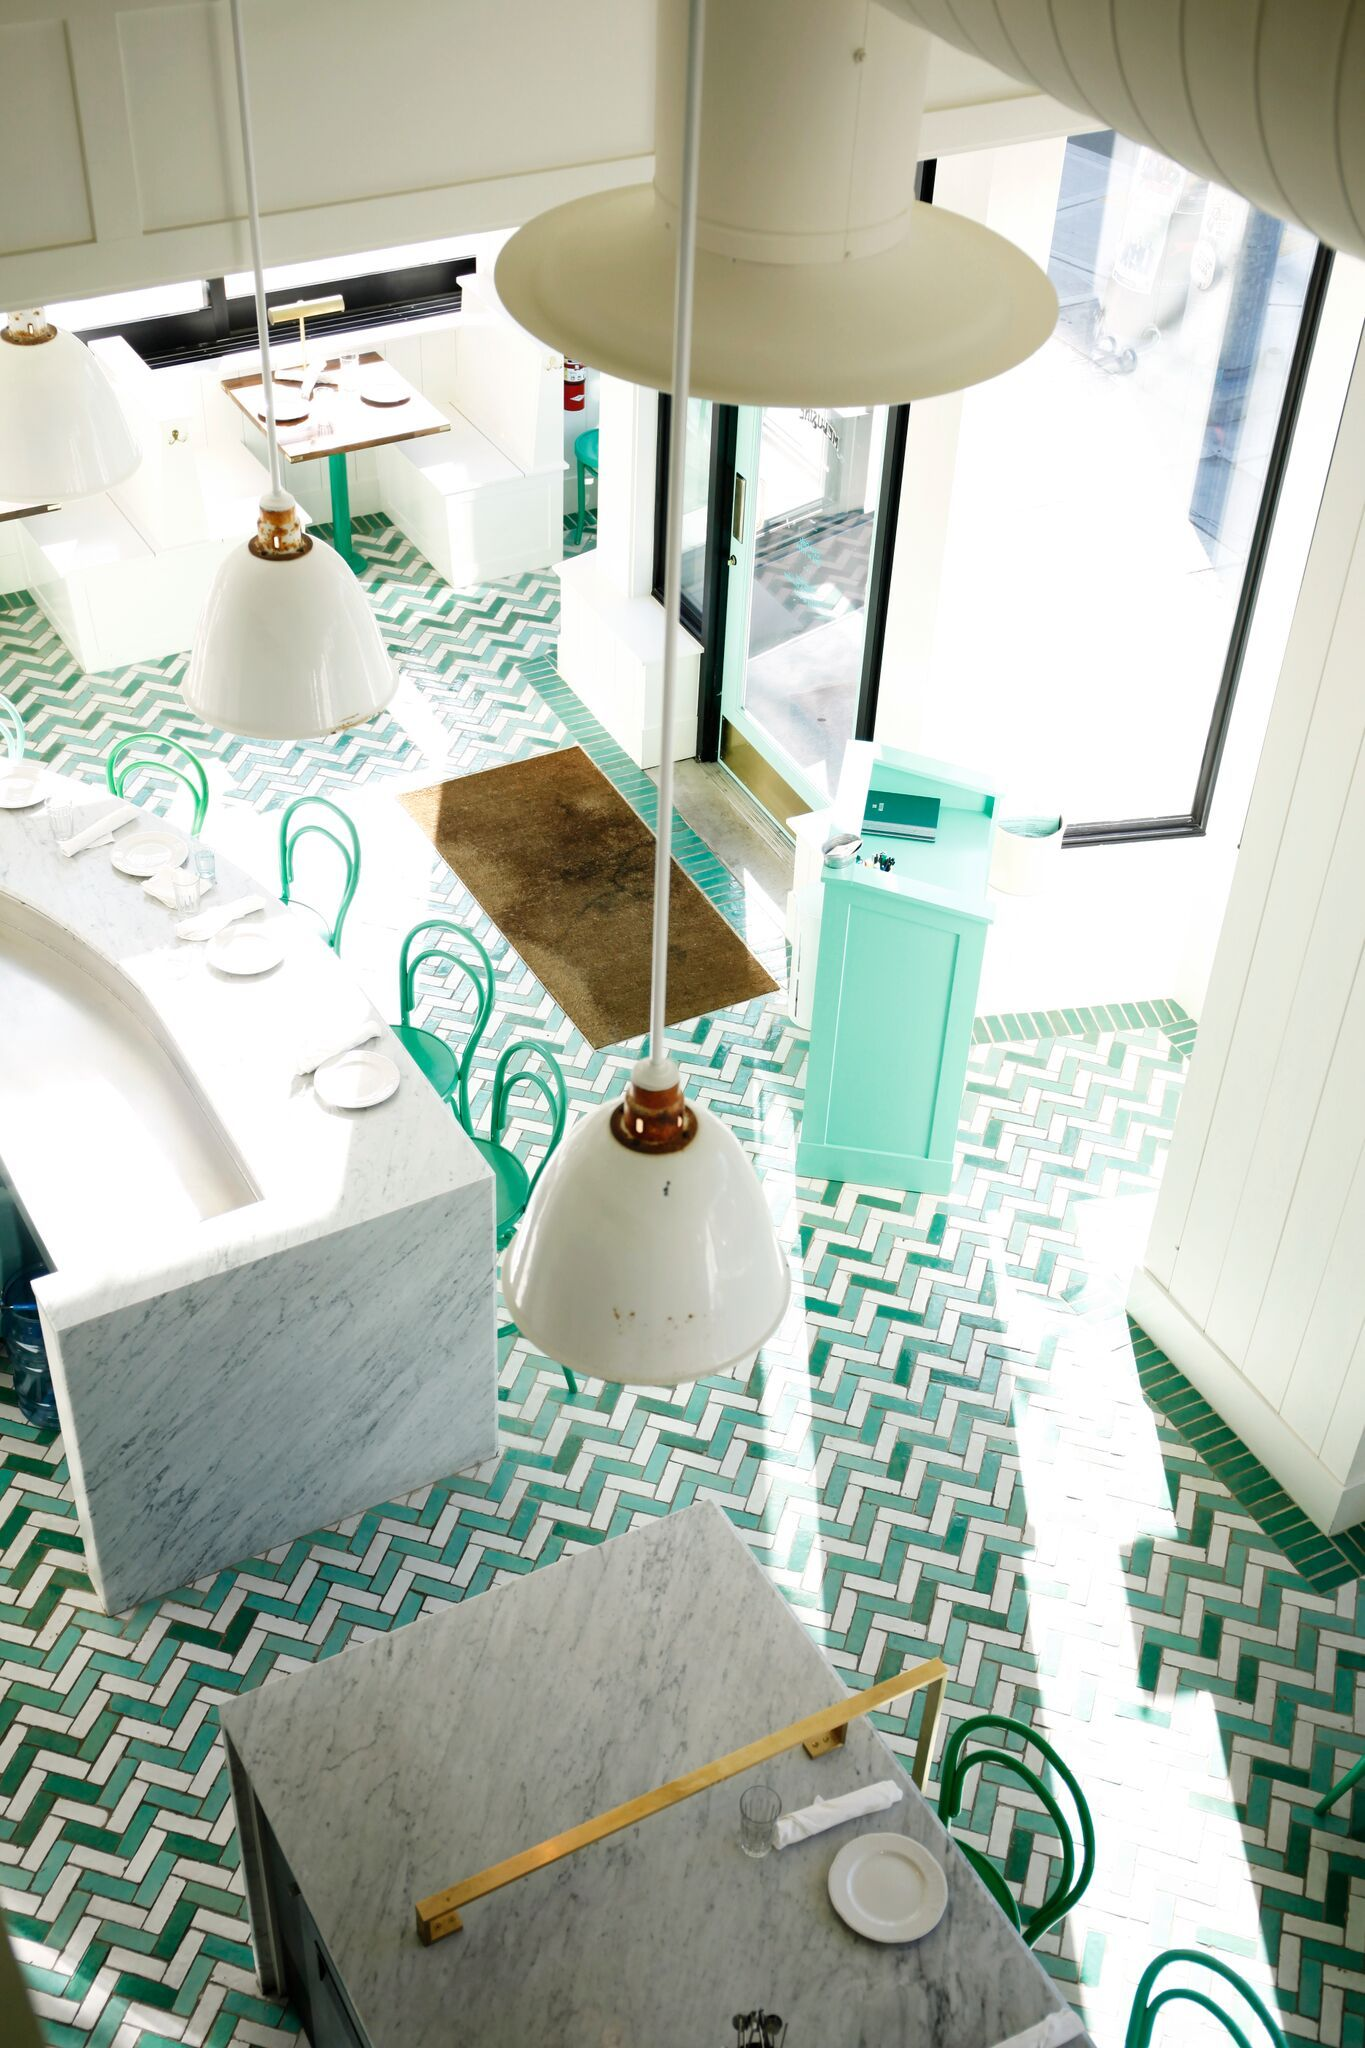 Wanderlust design bar melusine seattle restaurant - Restaurant interior design seattle ...